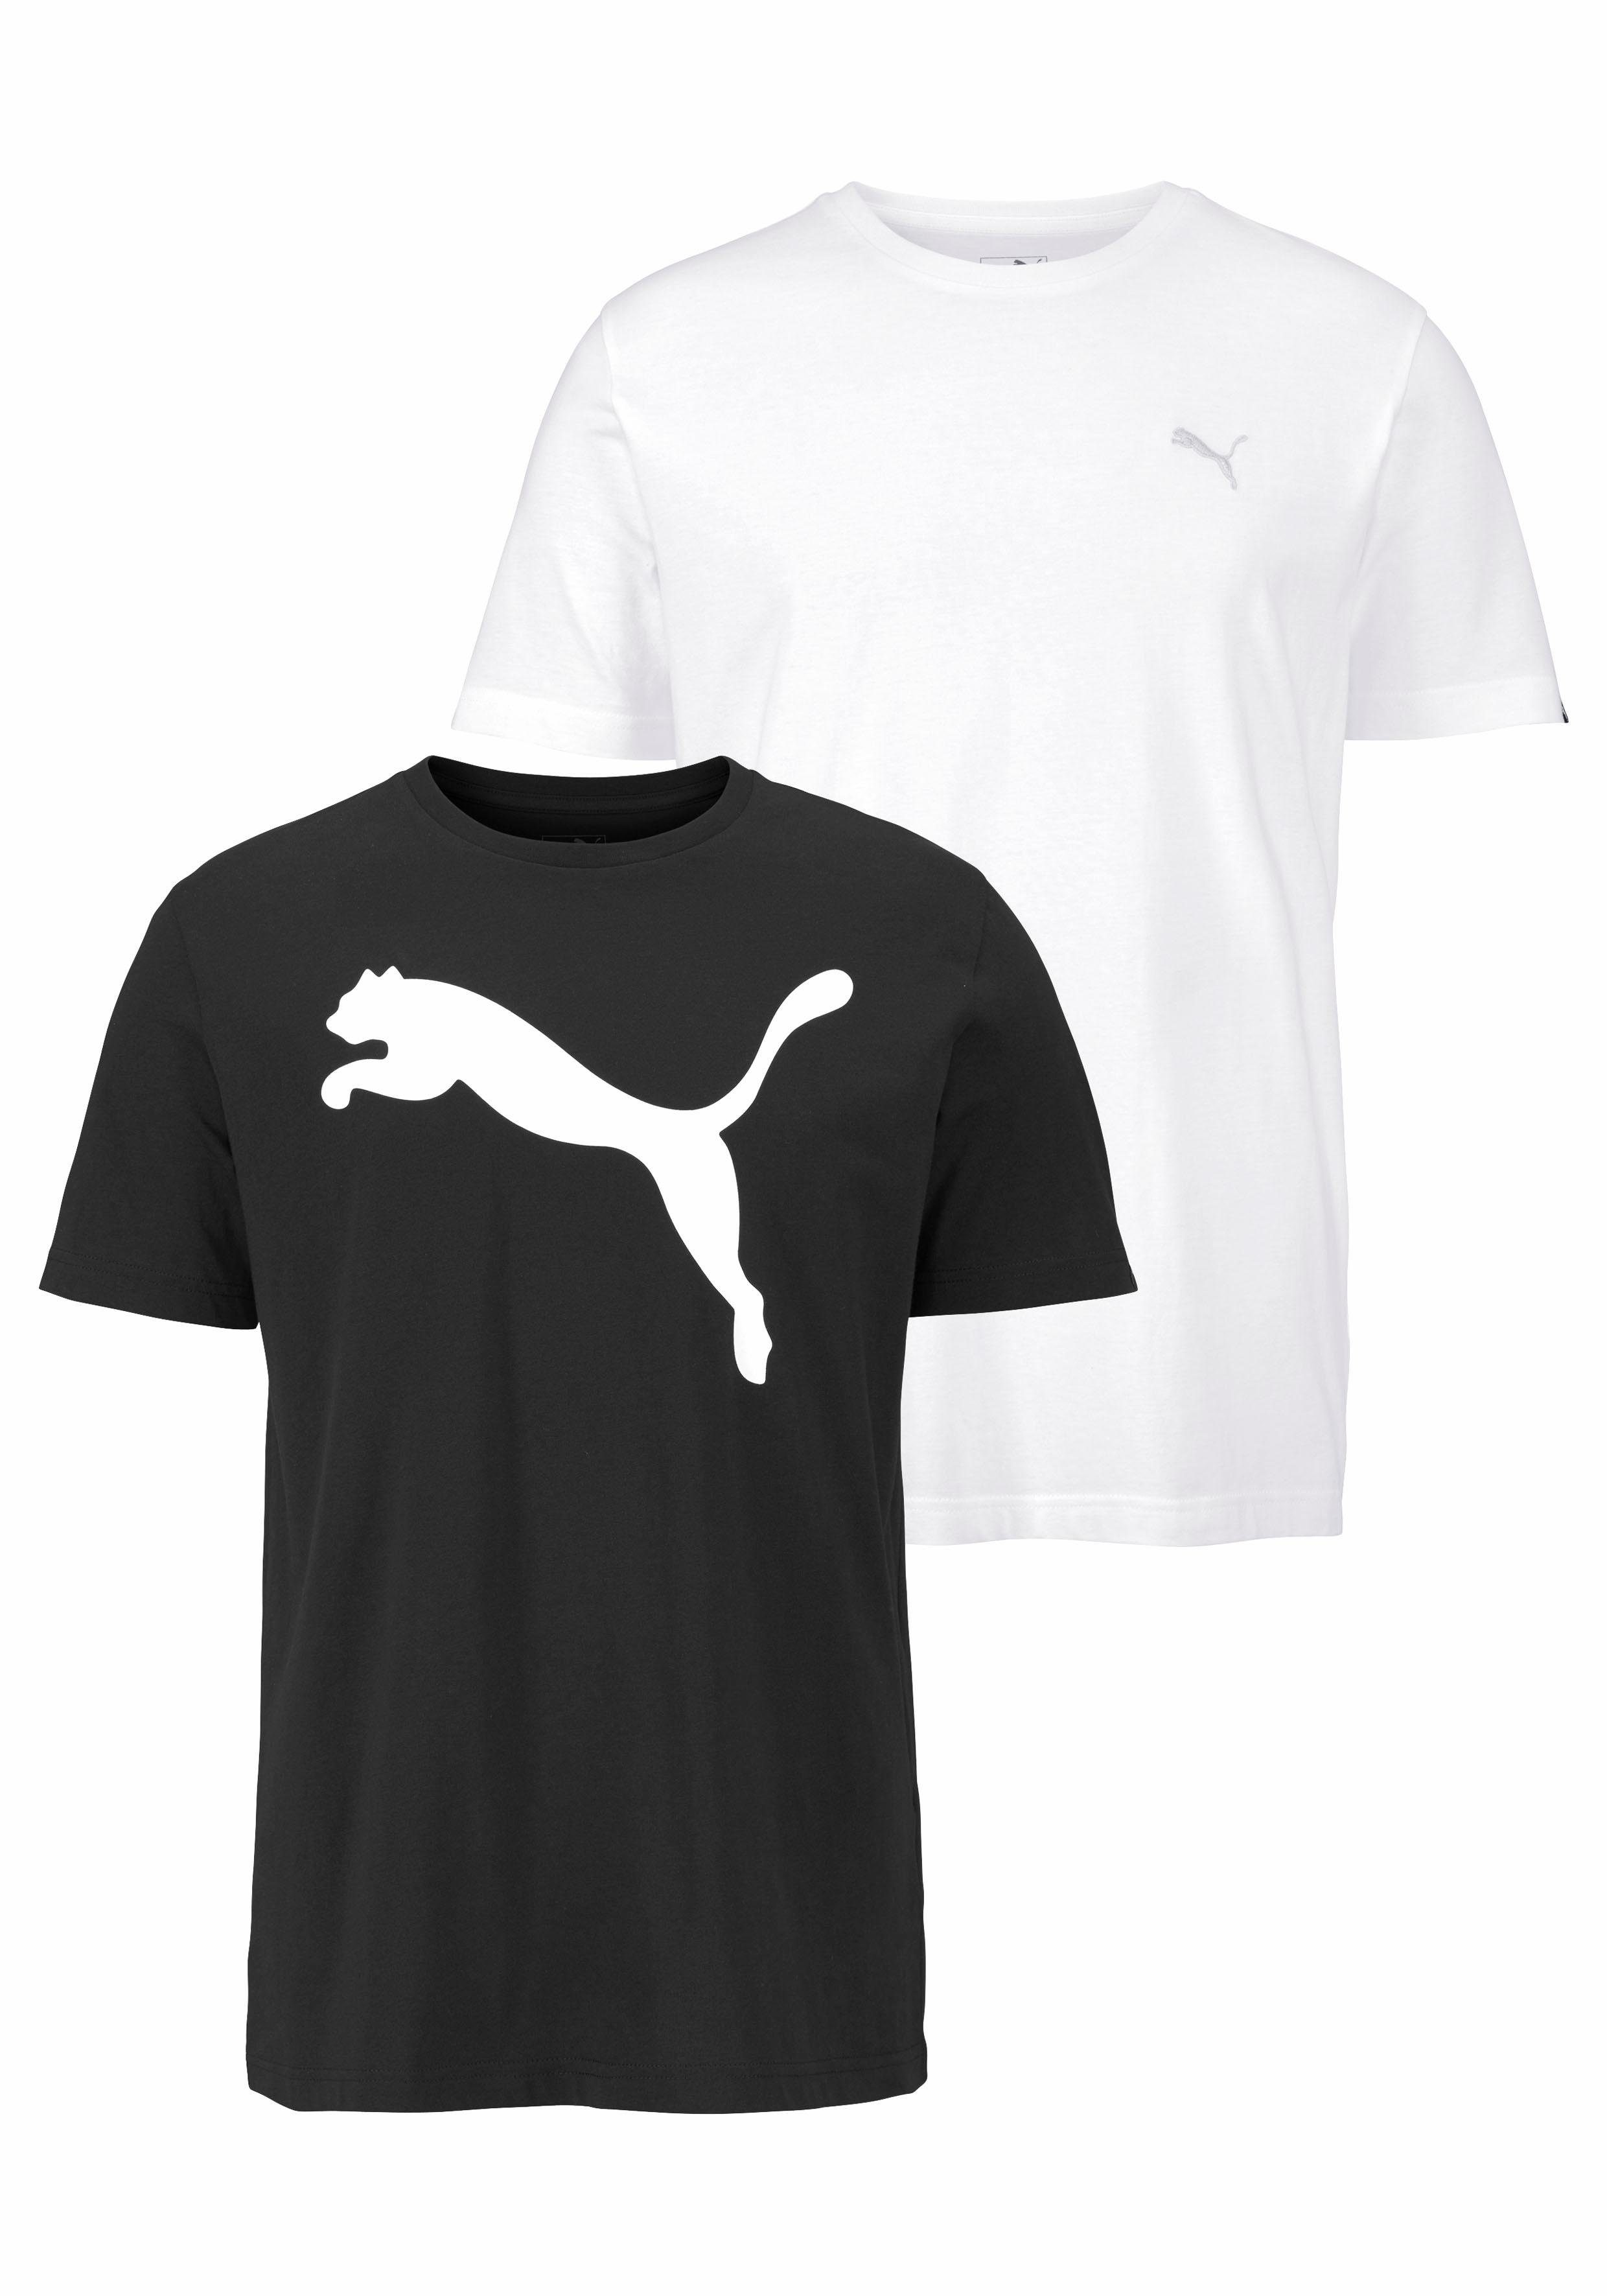 PUMA T Shirt »MENS TEE PACK PF 2« (Packung, 2 tlg., 2er Pack) online kaufen | OTTO